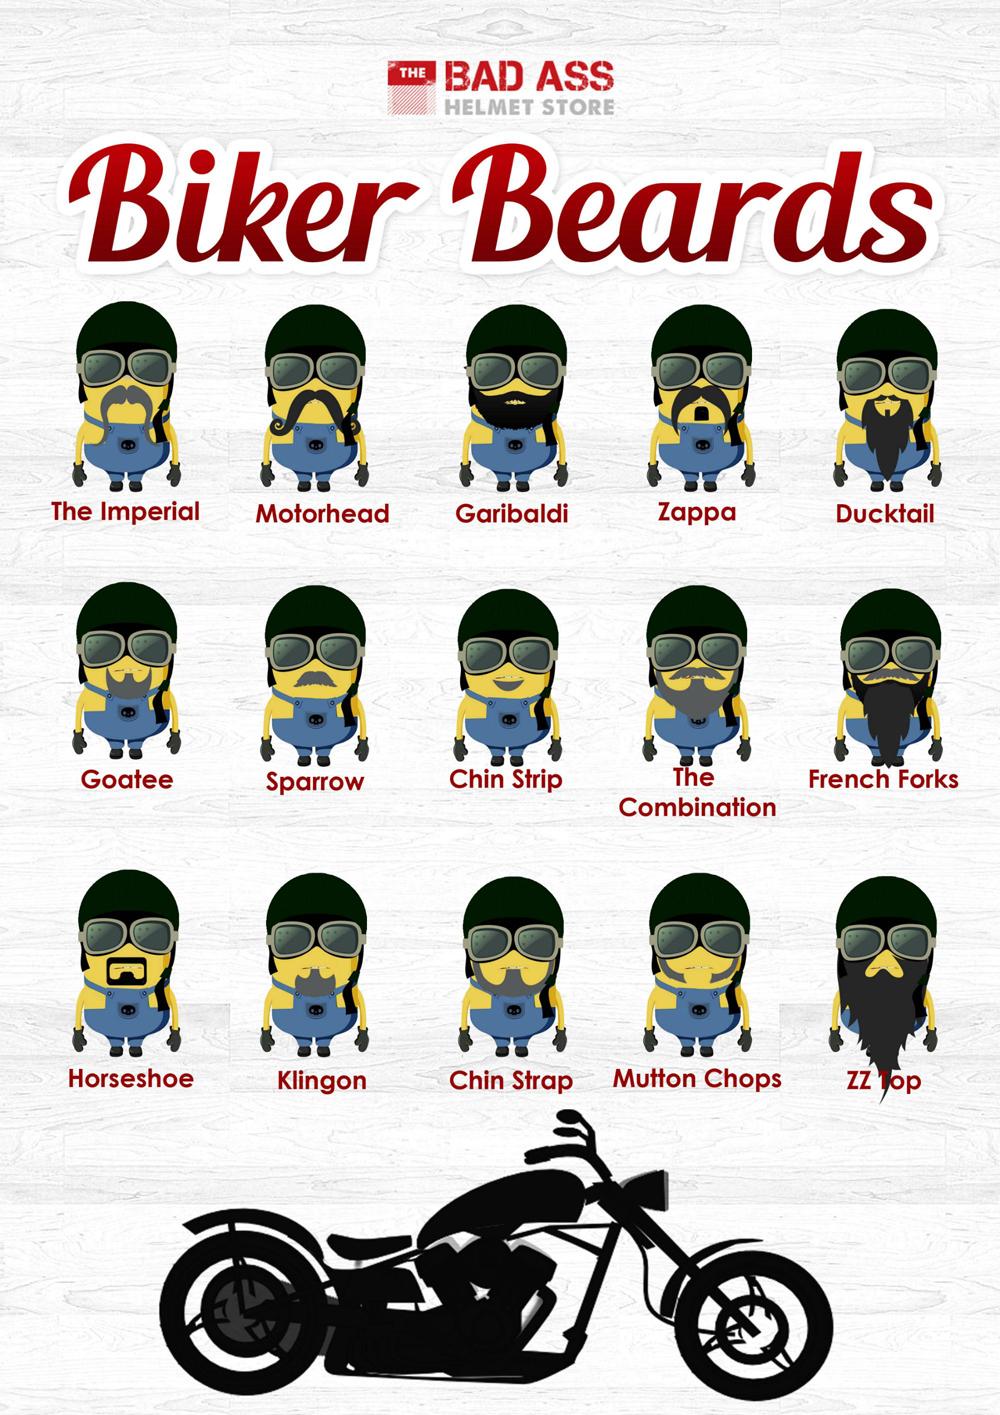 Minion-Biker-Beards-from-the-Badass-Helmet-Store-small